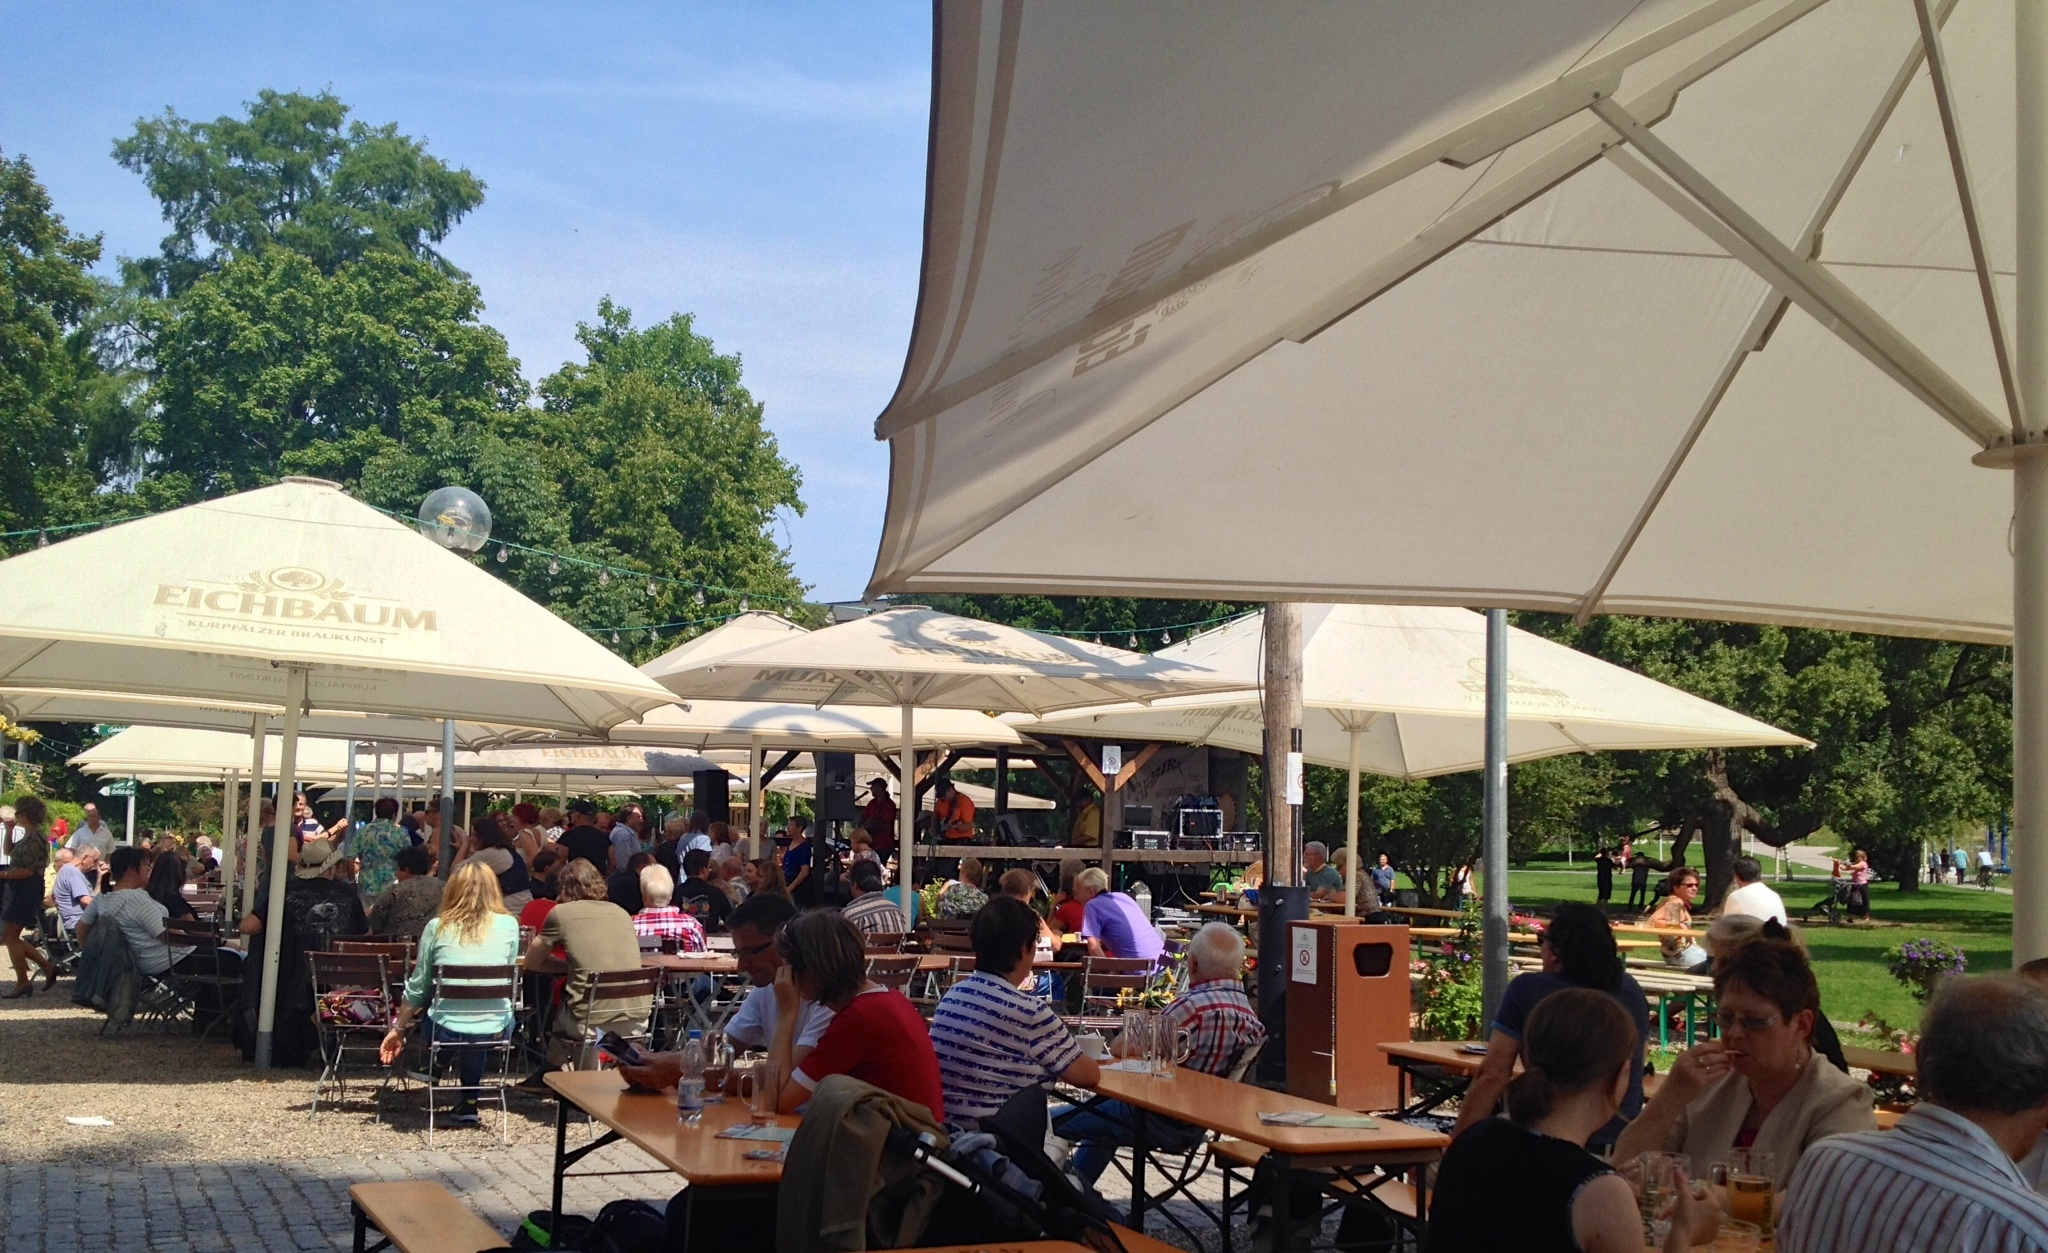 Picnic tables and benches at the Biergarten im Schlossgarten